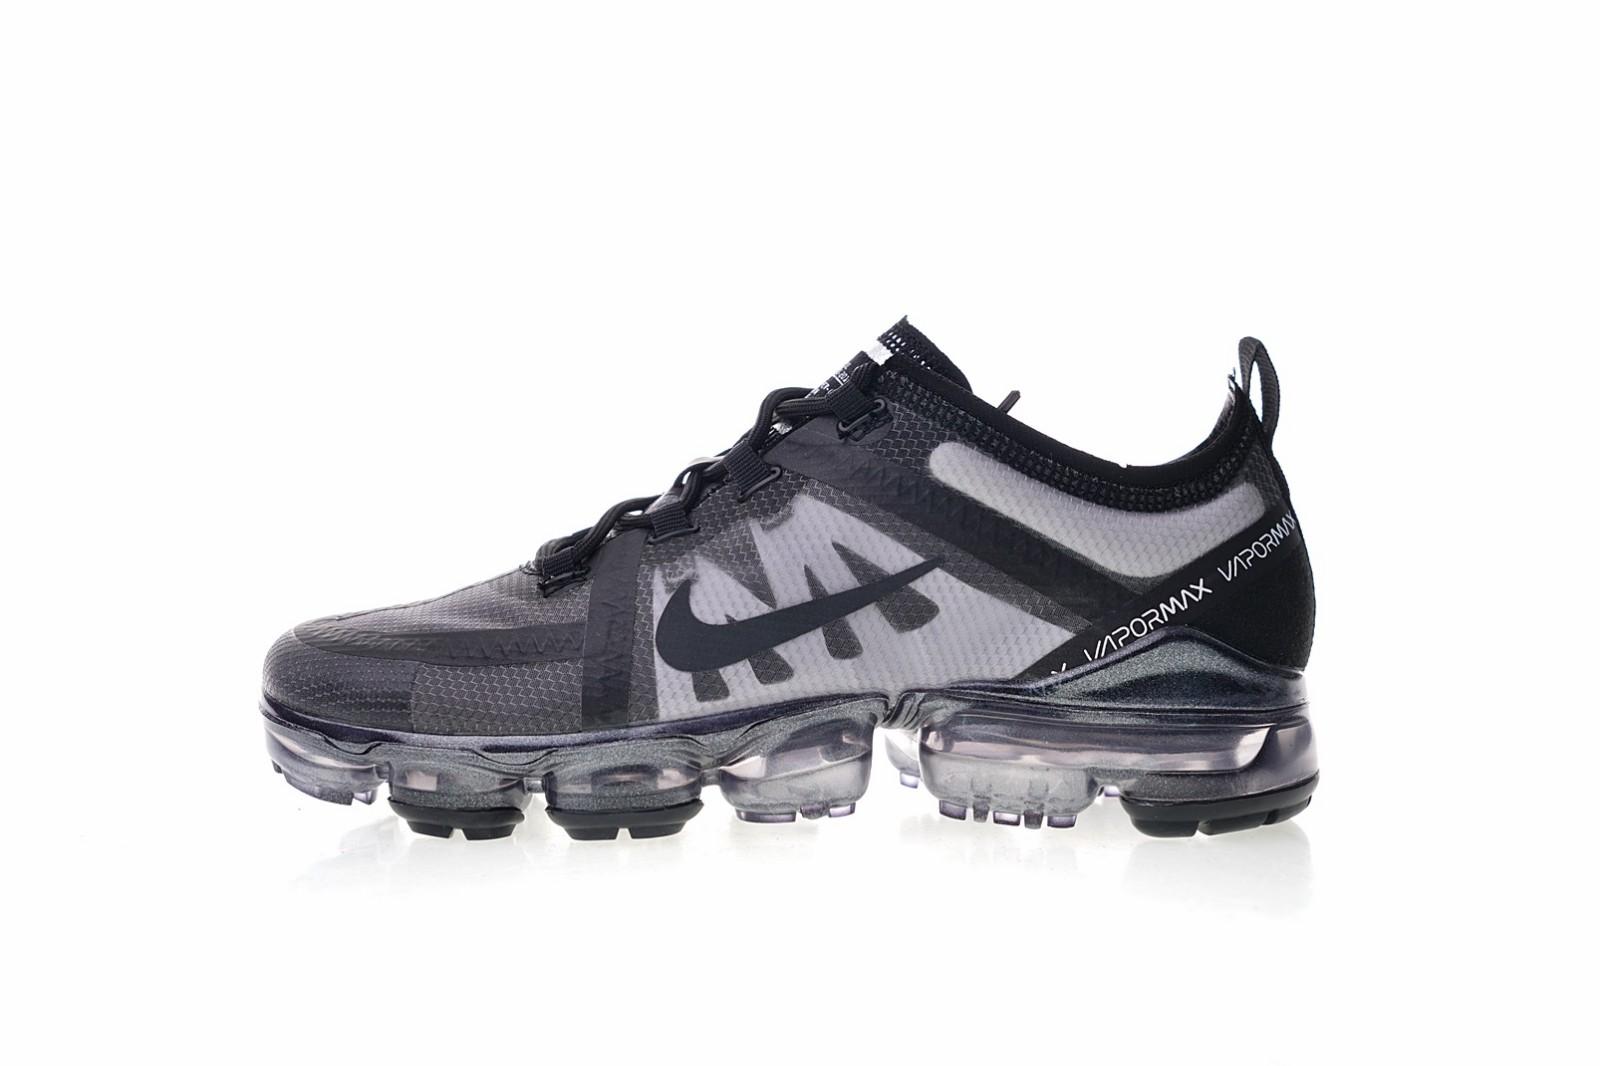 cd4034df9545b Nike Air VaporMax VM3 2019 Triple Black Metallic AR6631-004 - Febbuy